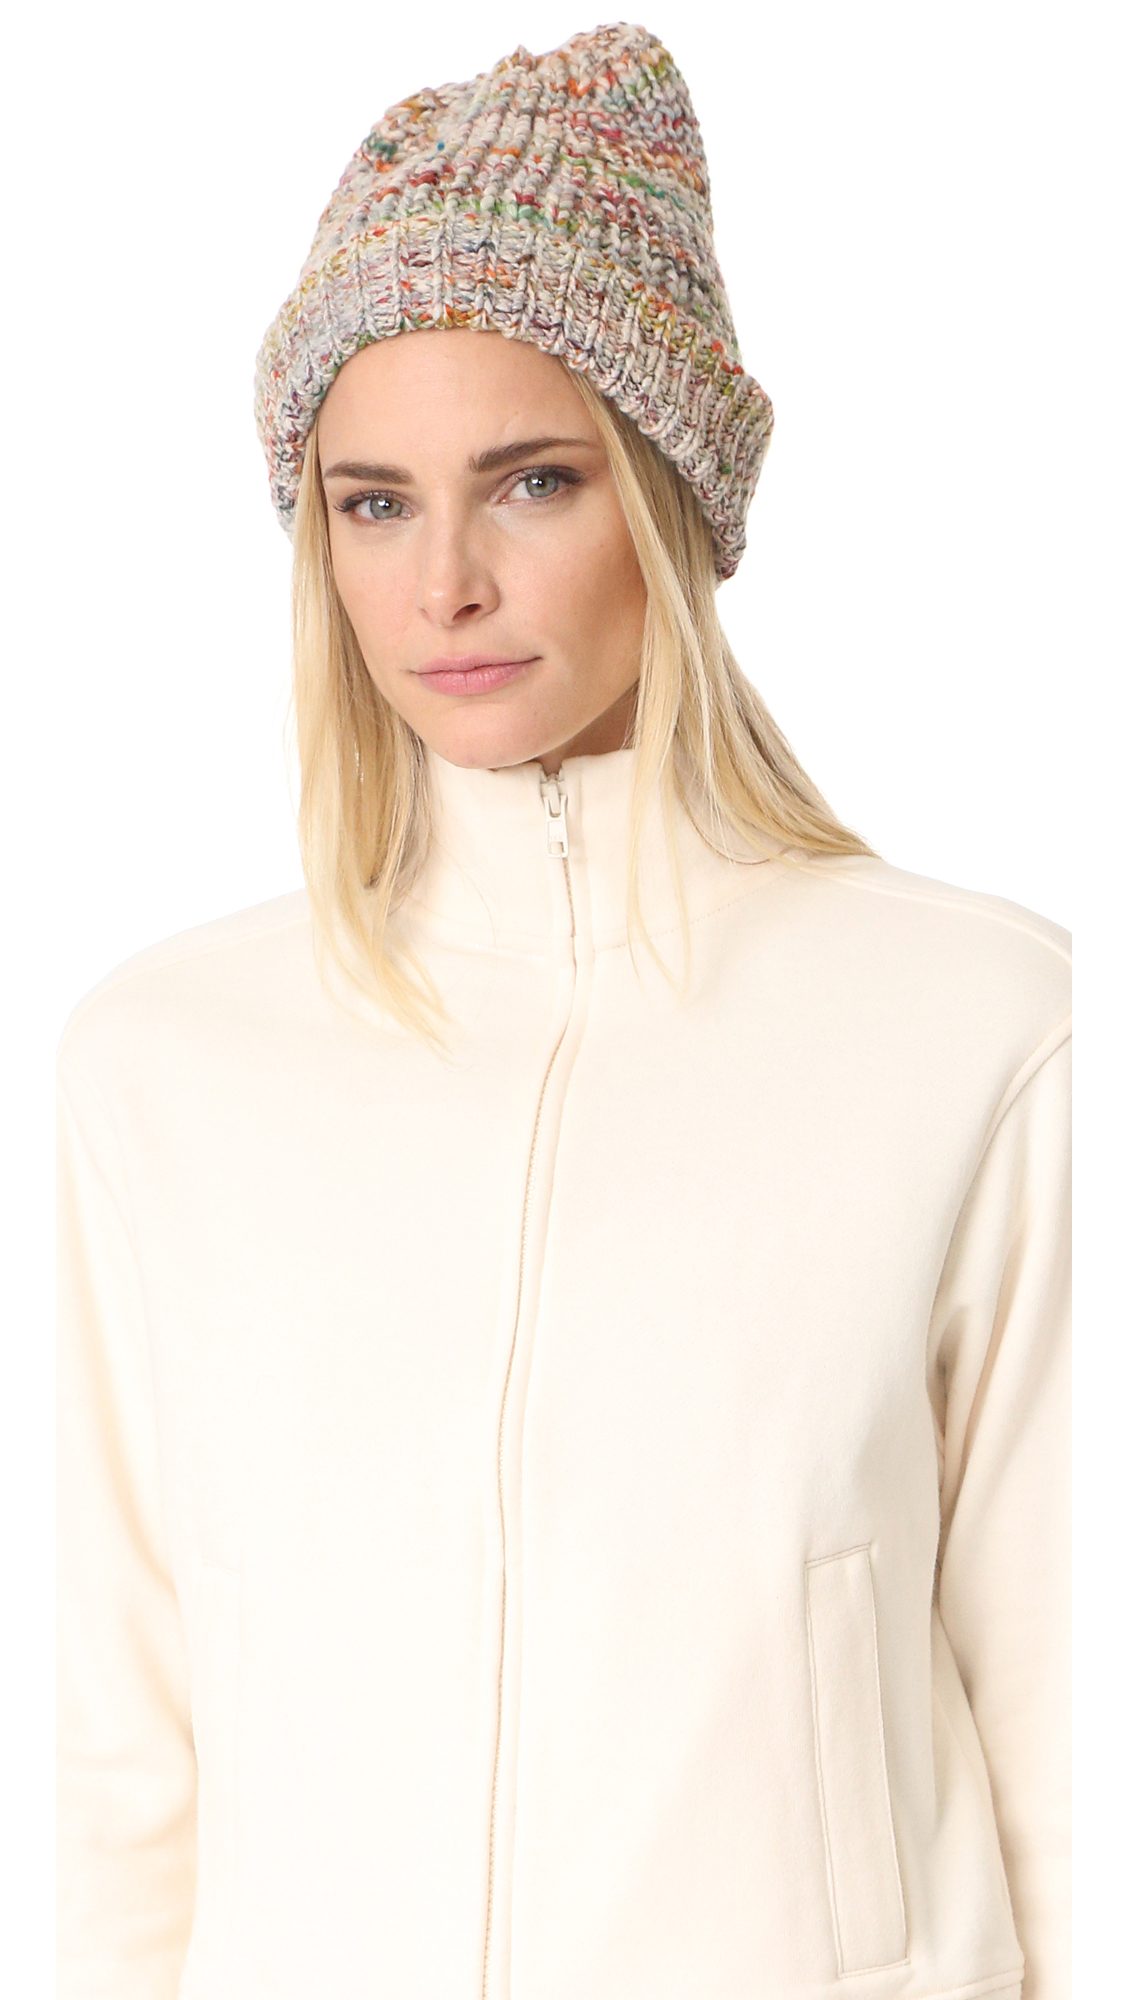 Acne Studios Zefir Multicolor Hat - White Multi at Shopbop